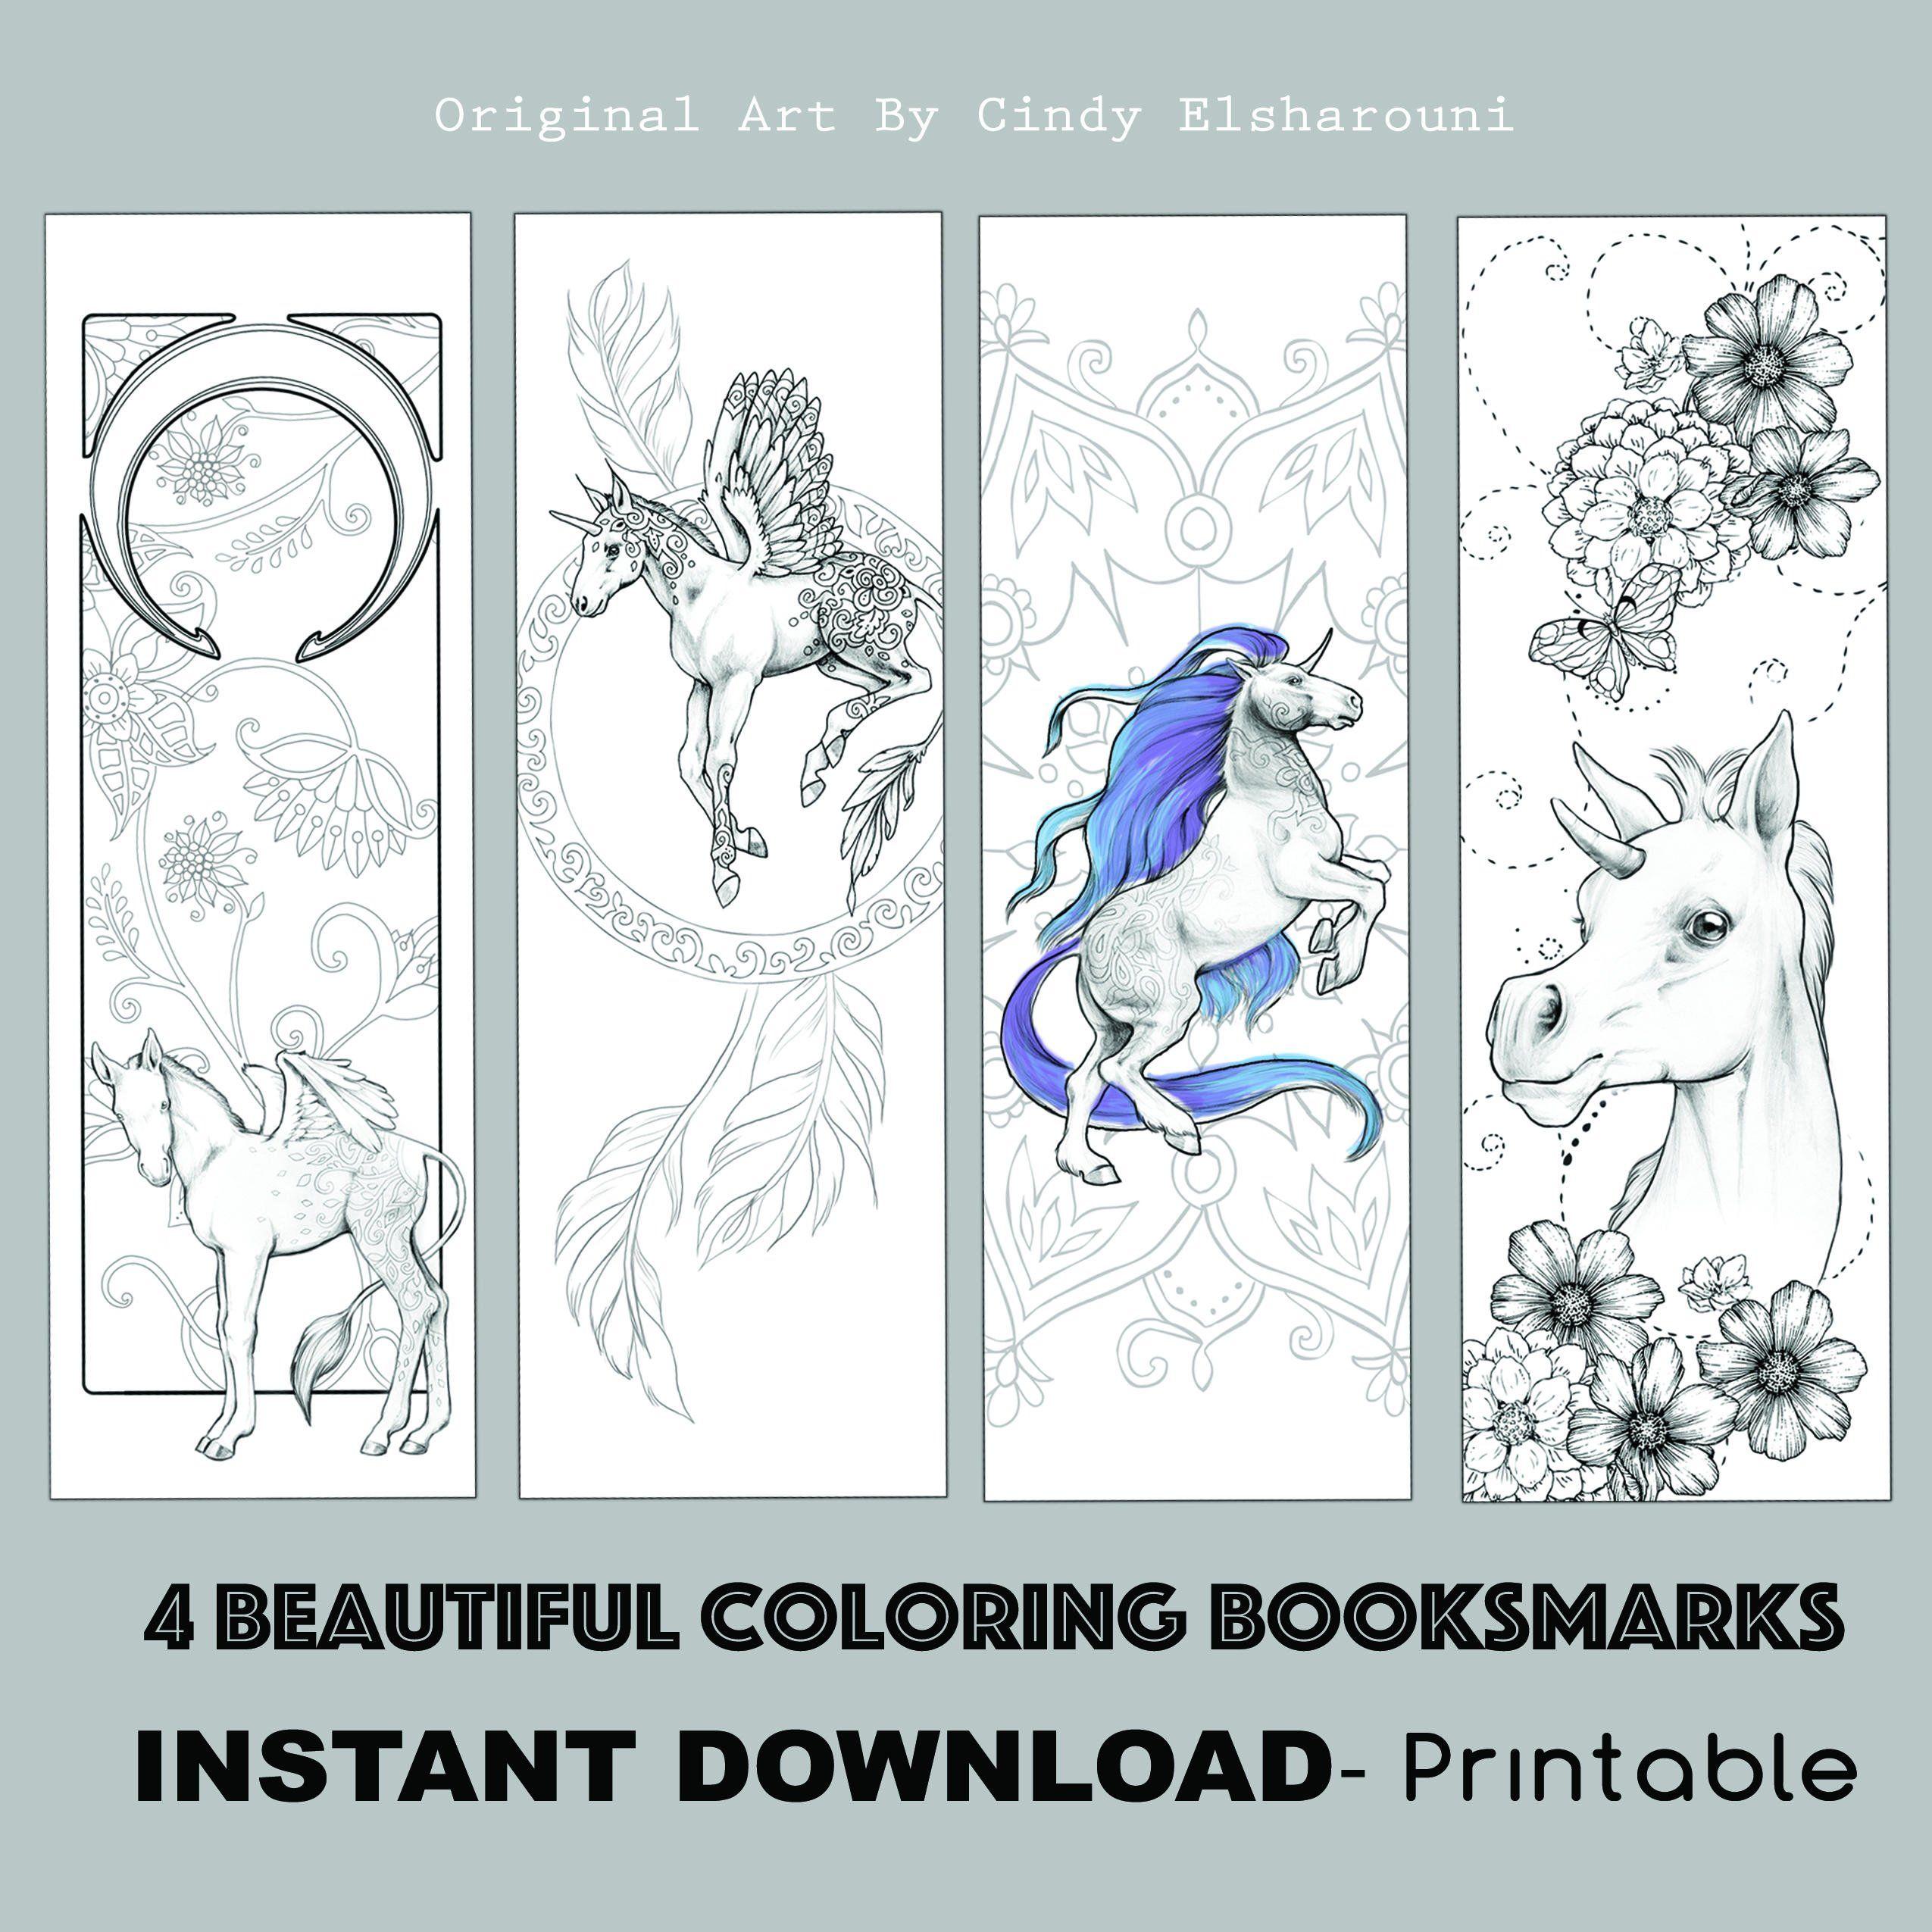 d.i.y book mark prints instant download bookmark coloring